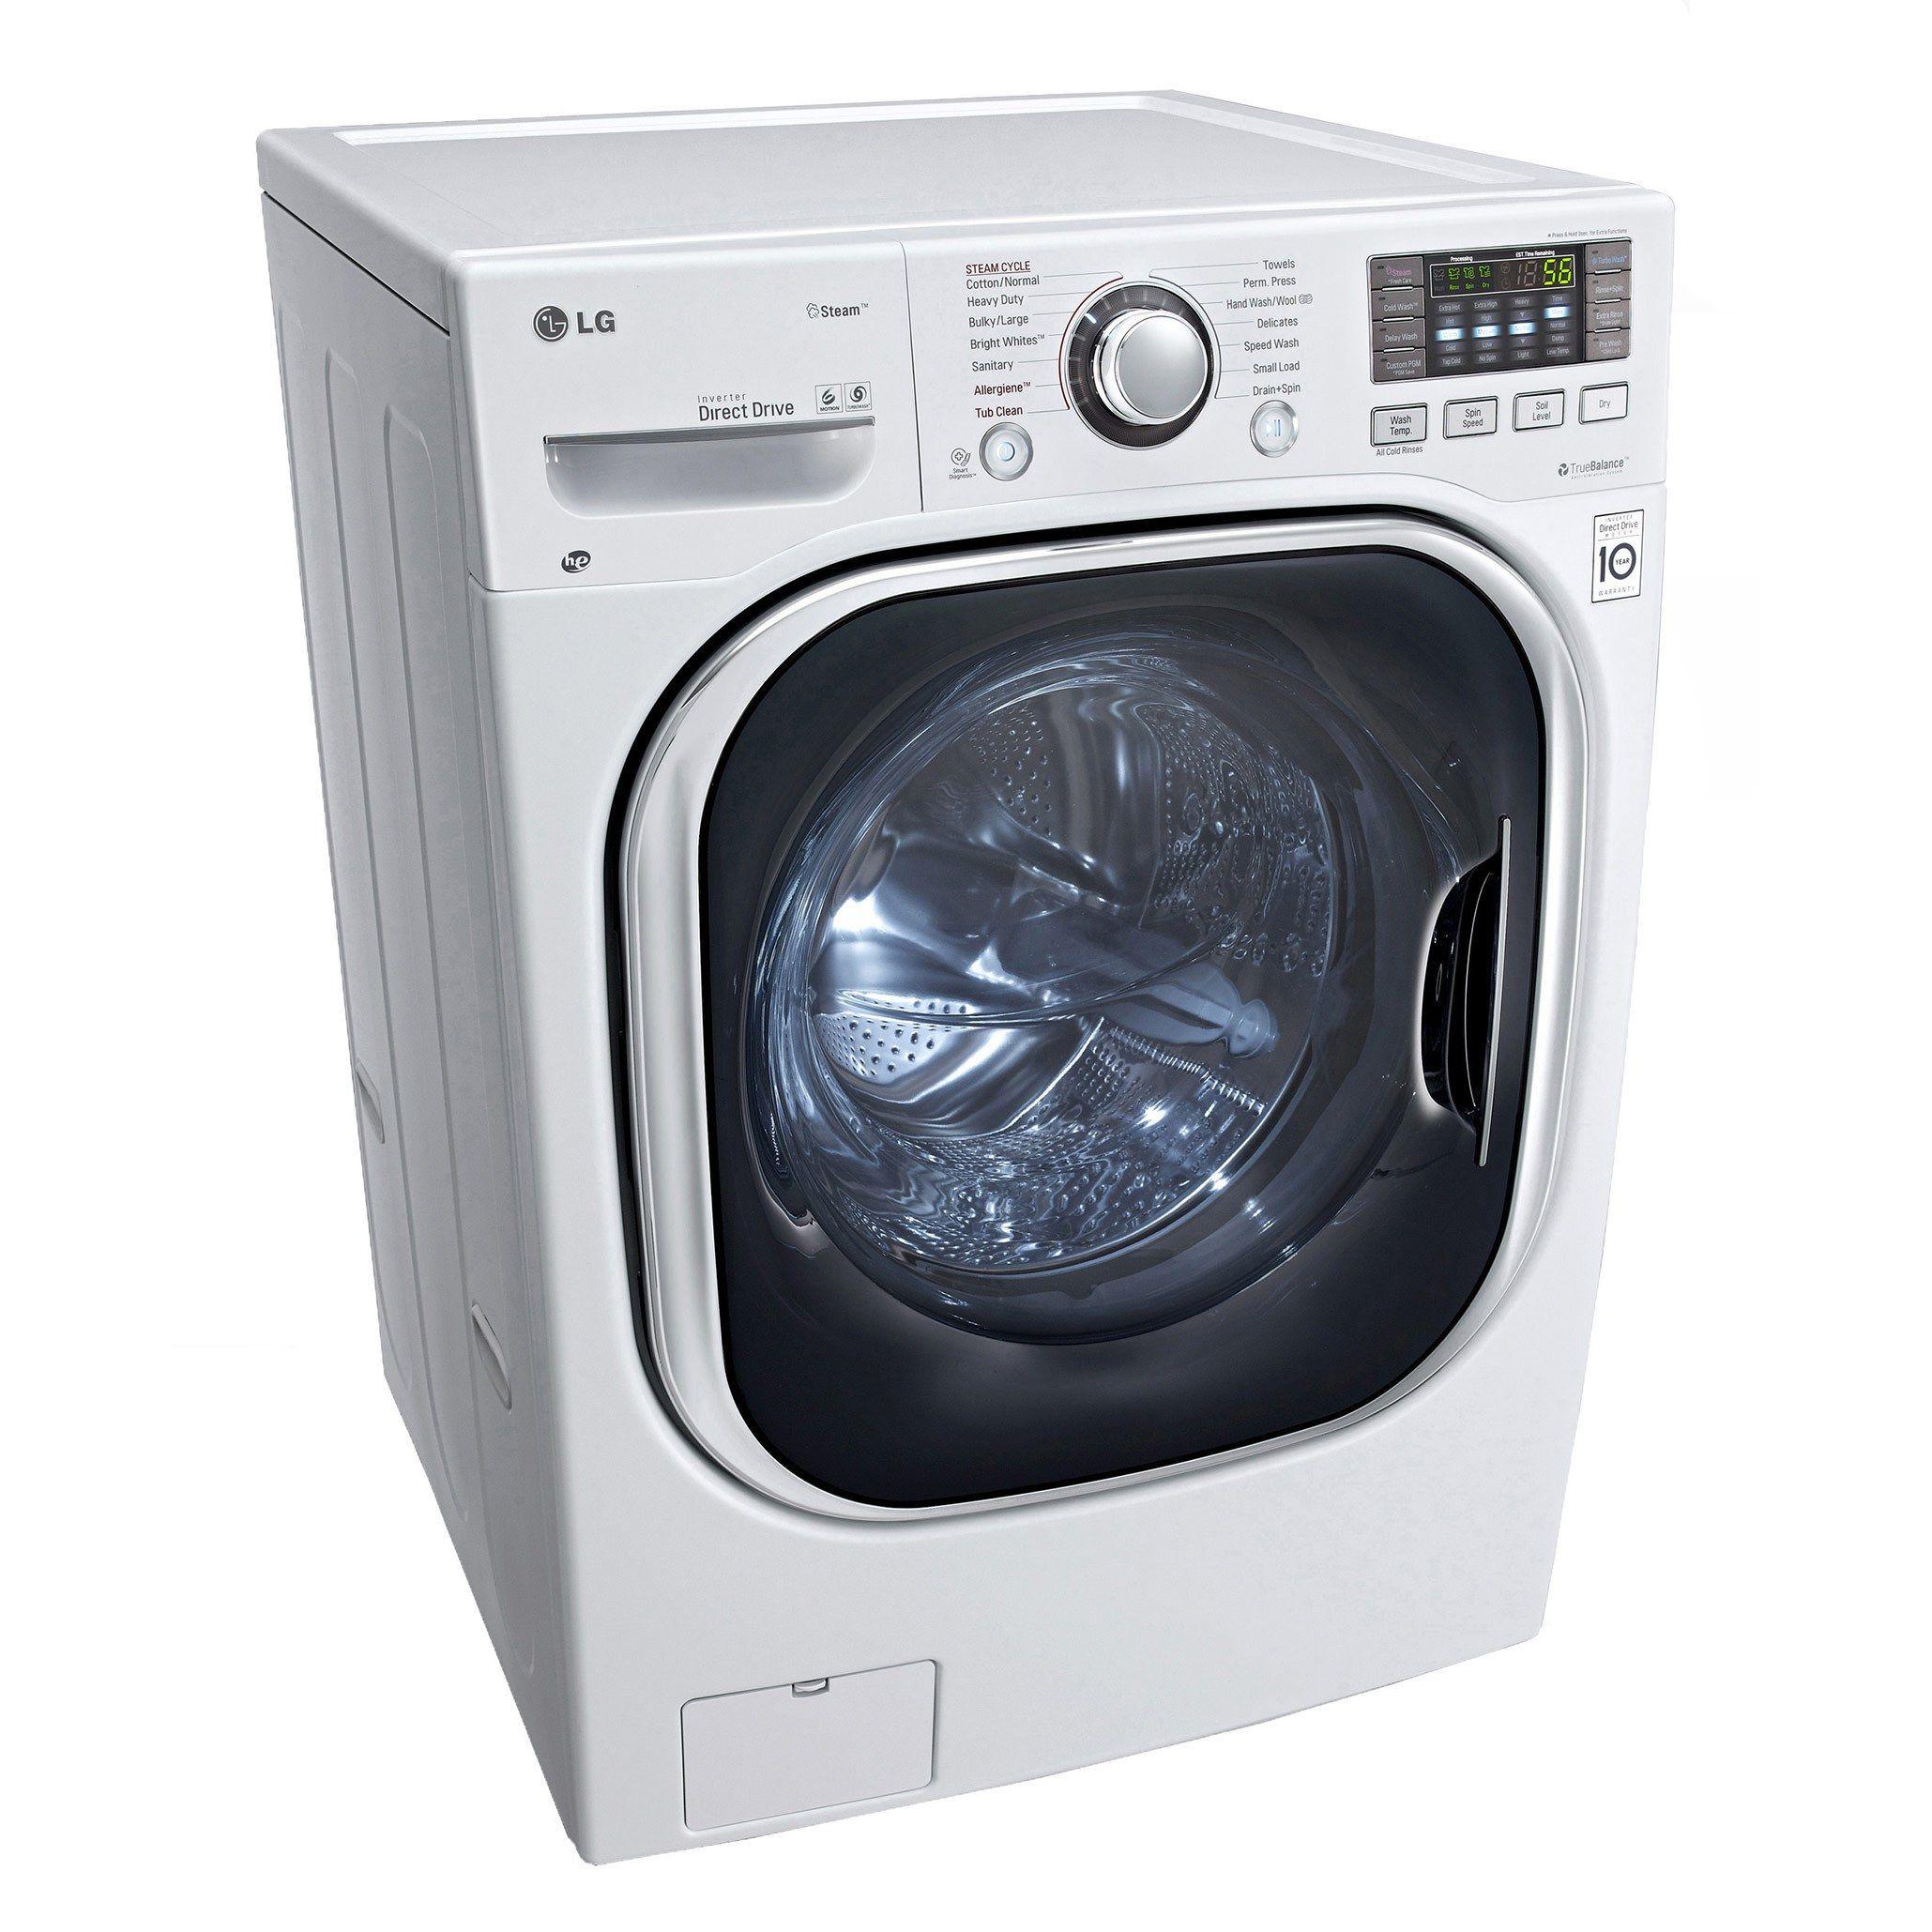 Lg Wm3488hw 24 Compact Ventless Washer Dryer Combo White Ventless Washer Dryer Washer Dryer Combo Ventless Dryer